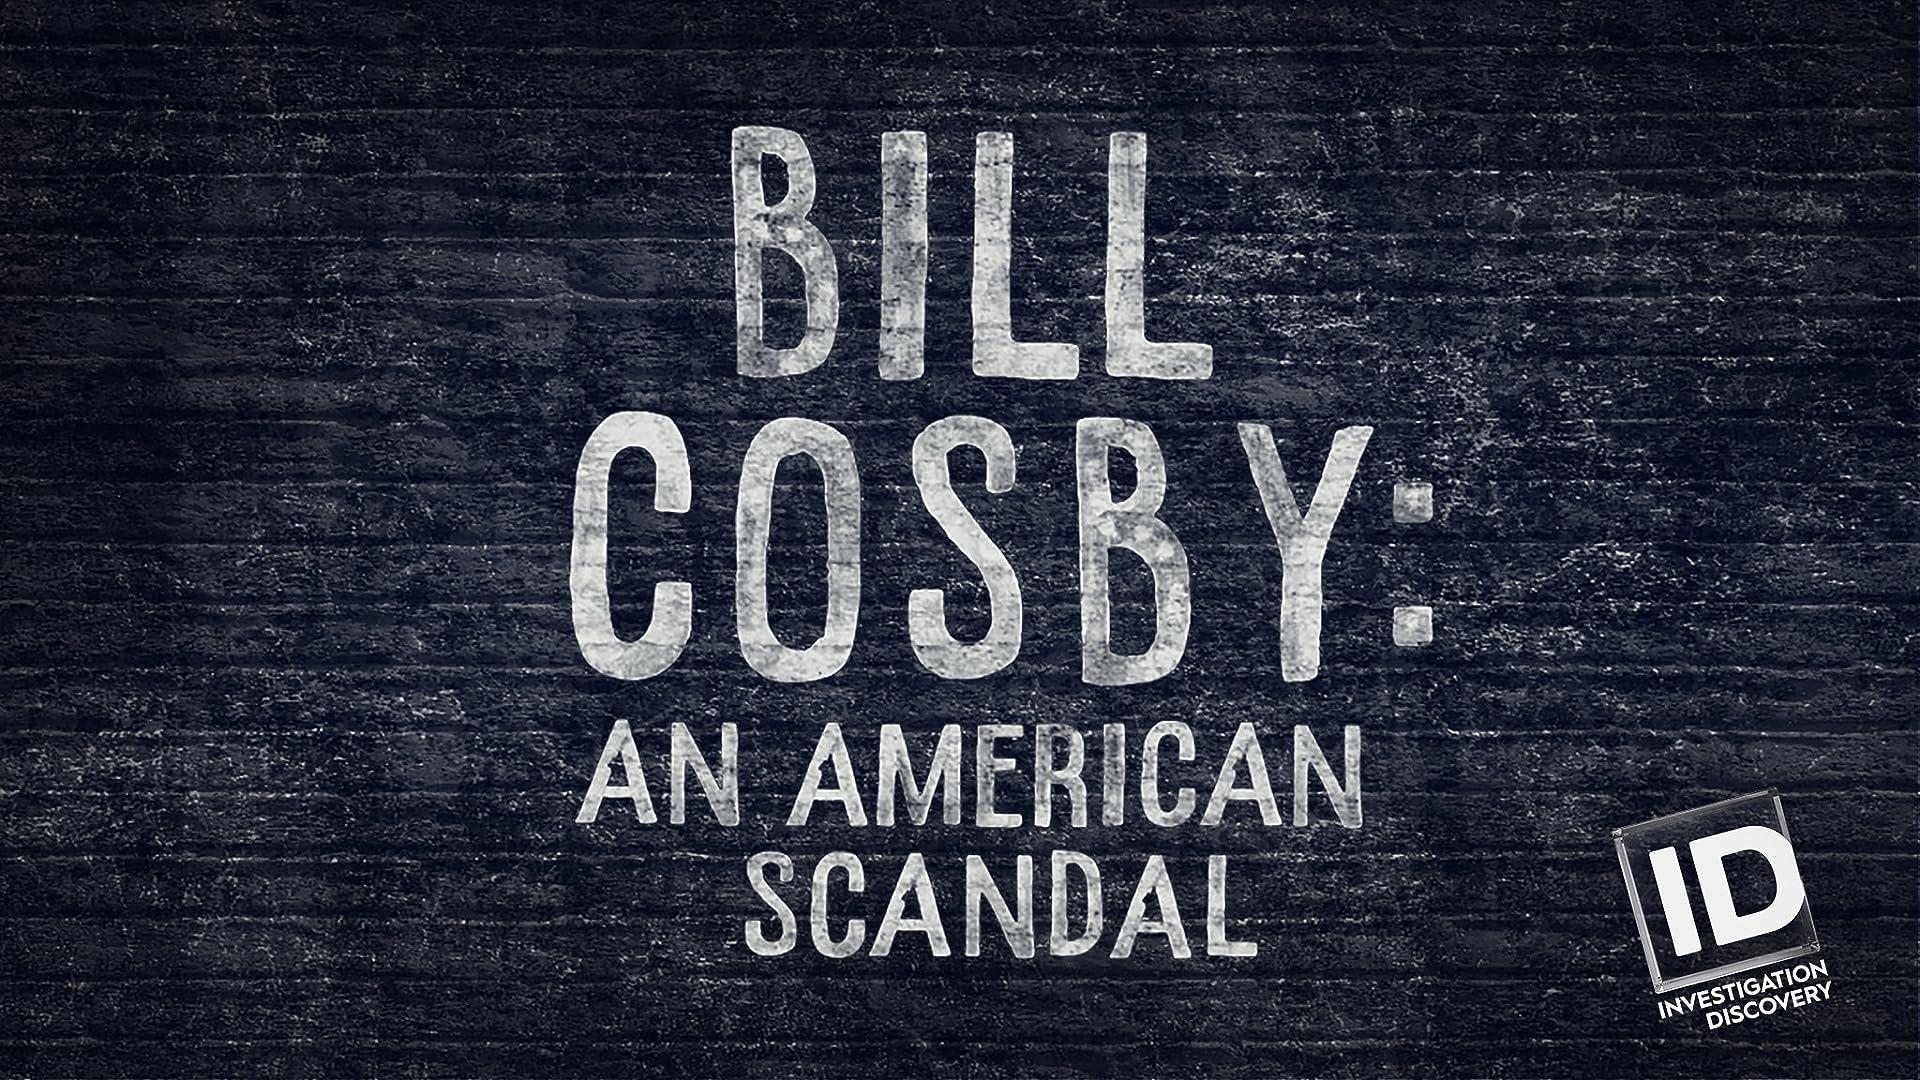 Bill Cosby: An American Scandal - Season 1